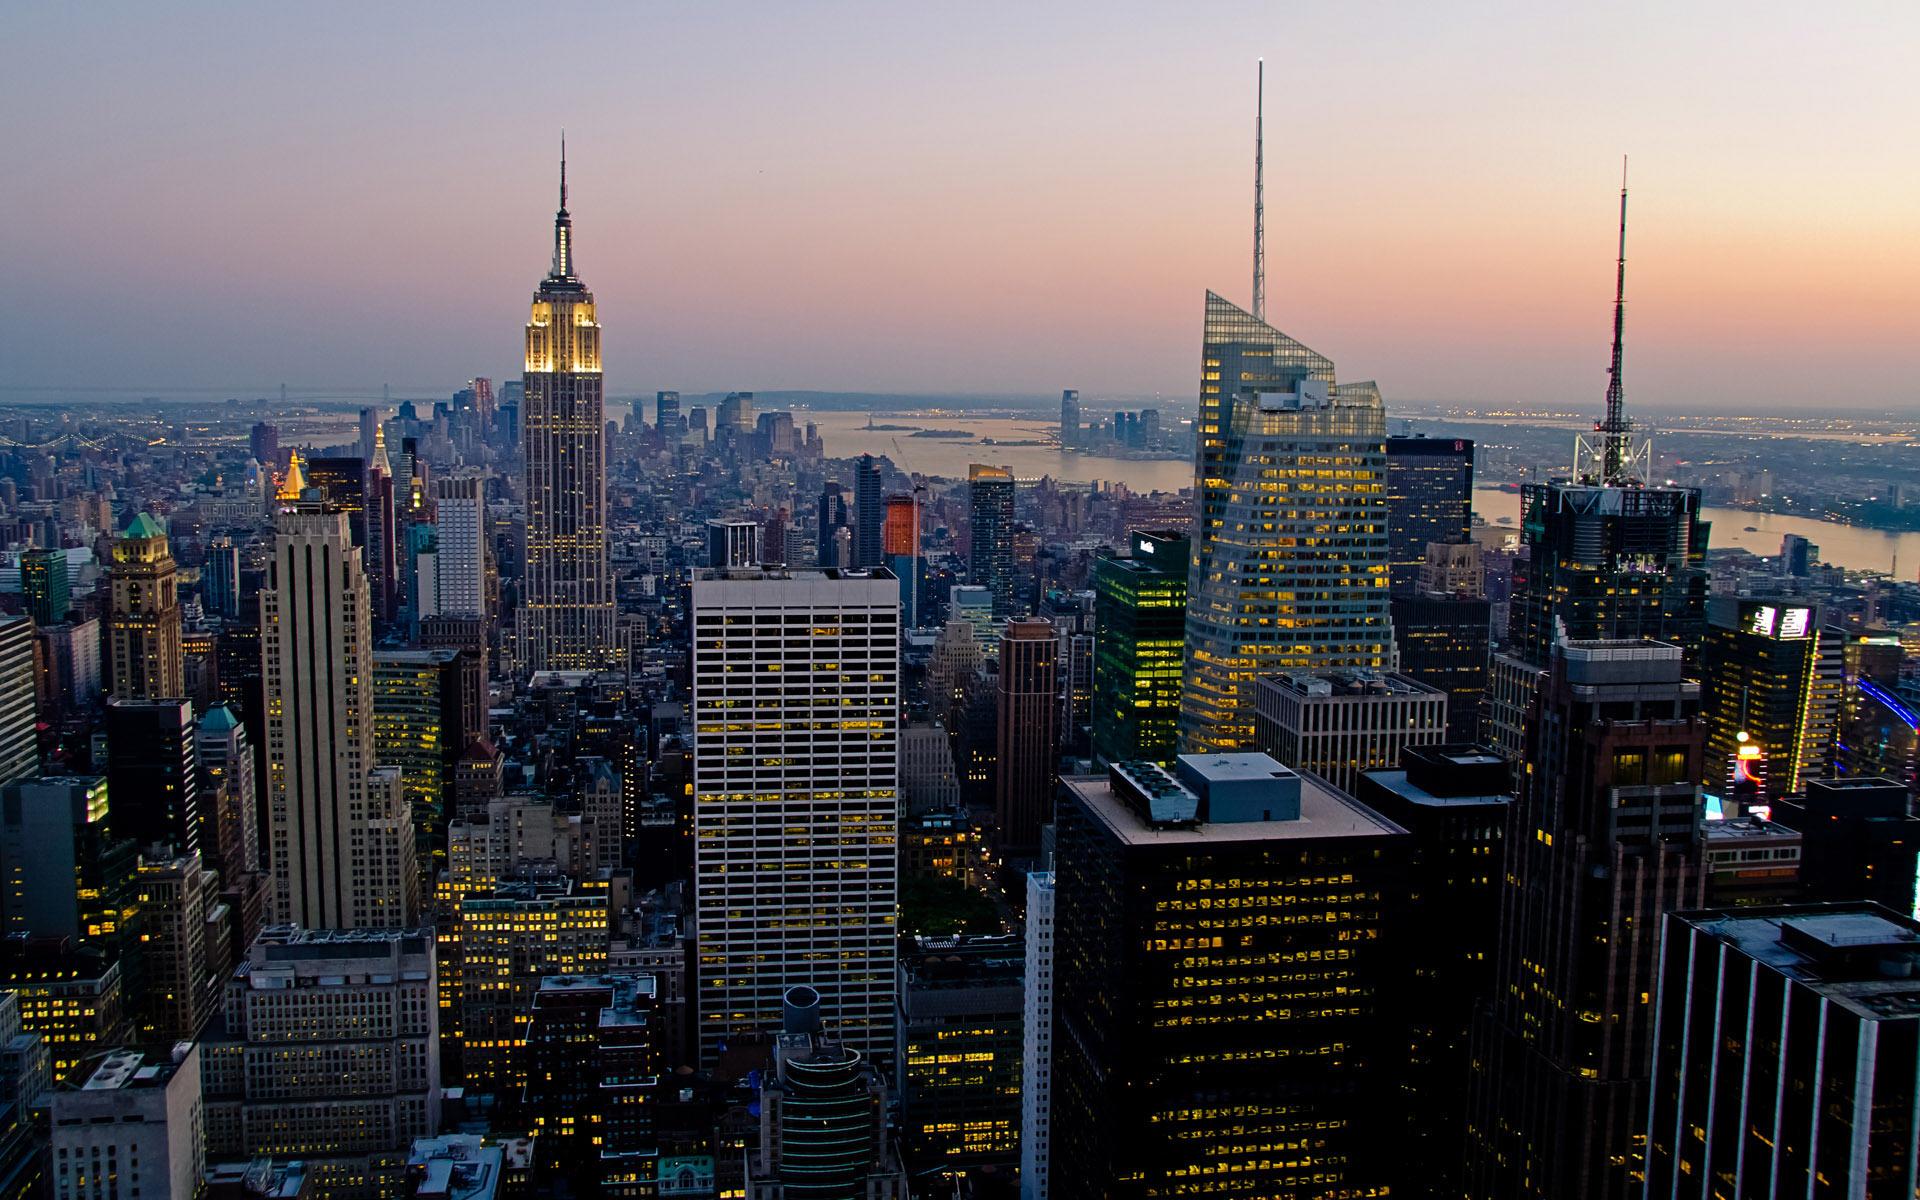 New York City New York City Wallpaper 4 Wallpapermint 1920x1200